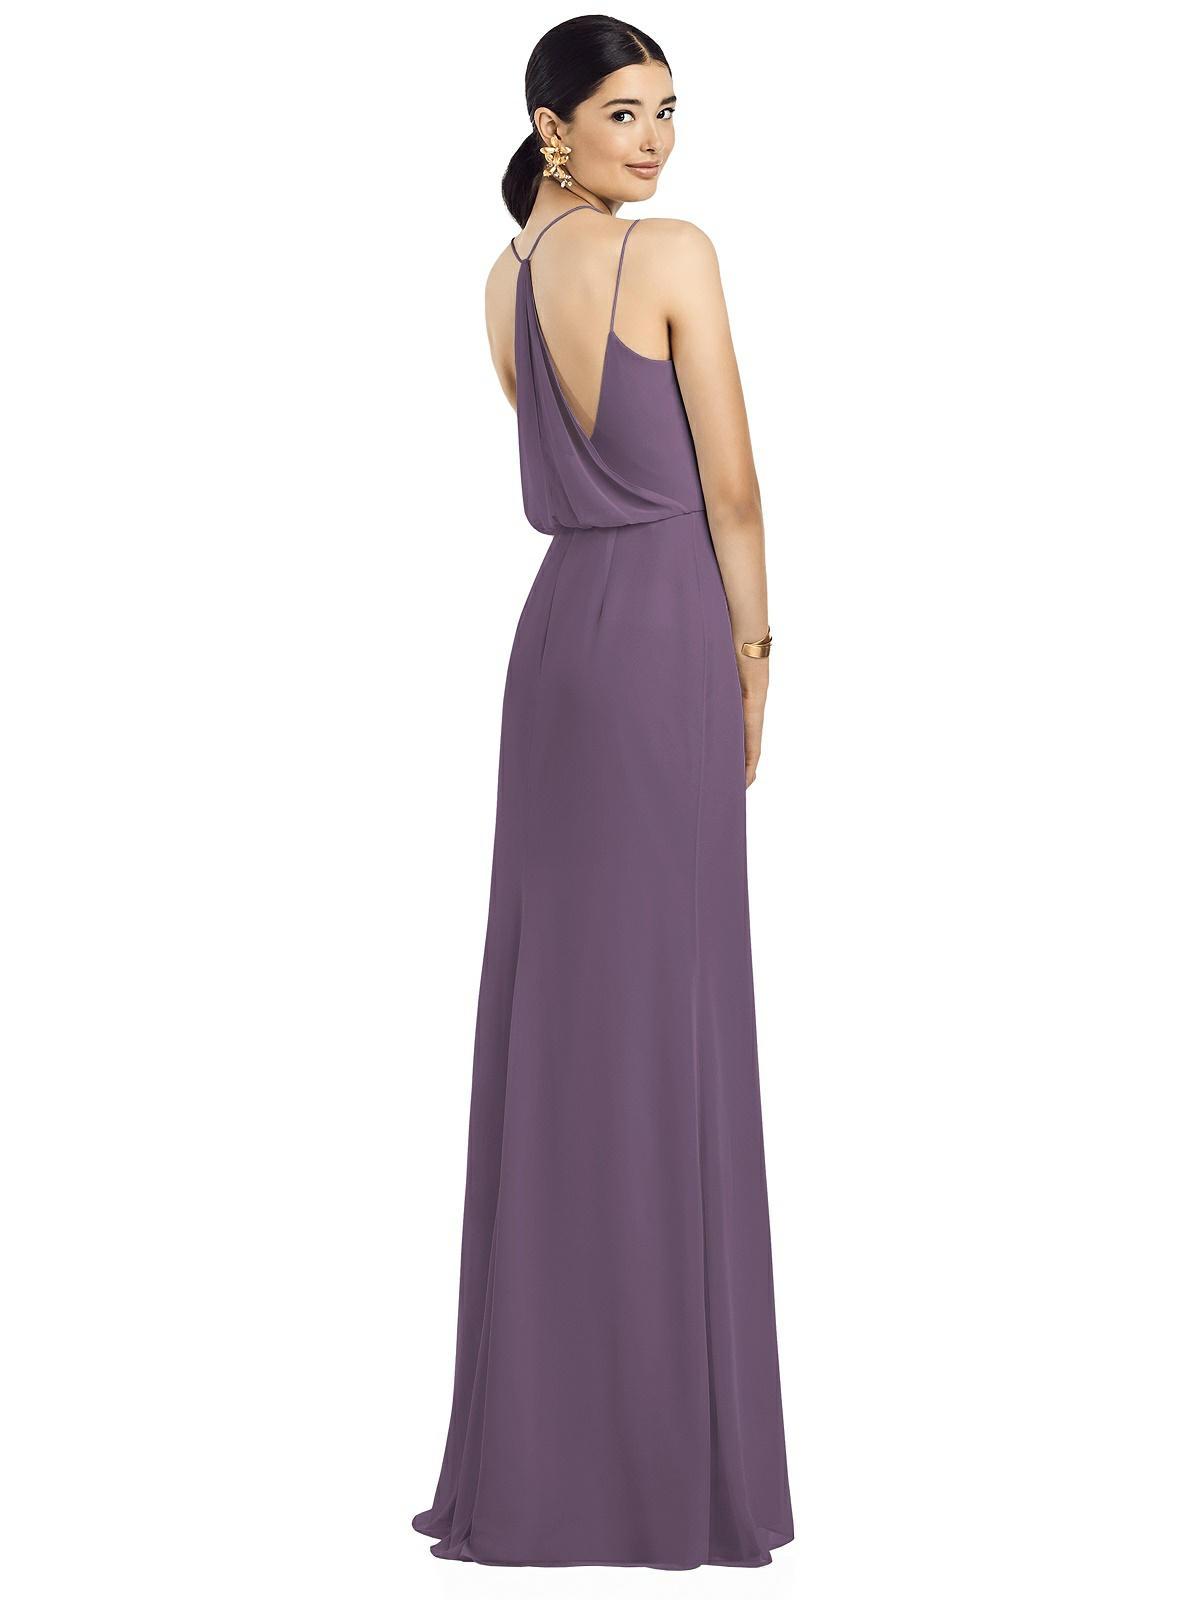 cassis color bridesmaid dress